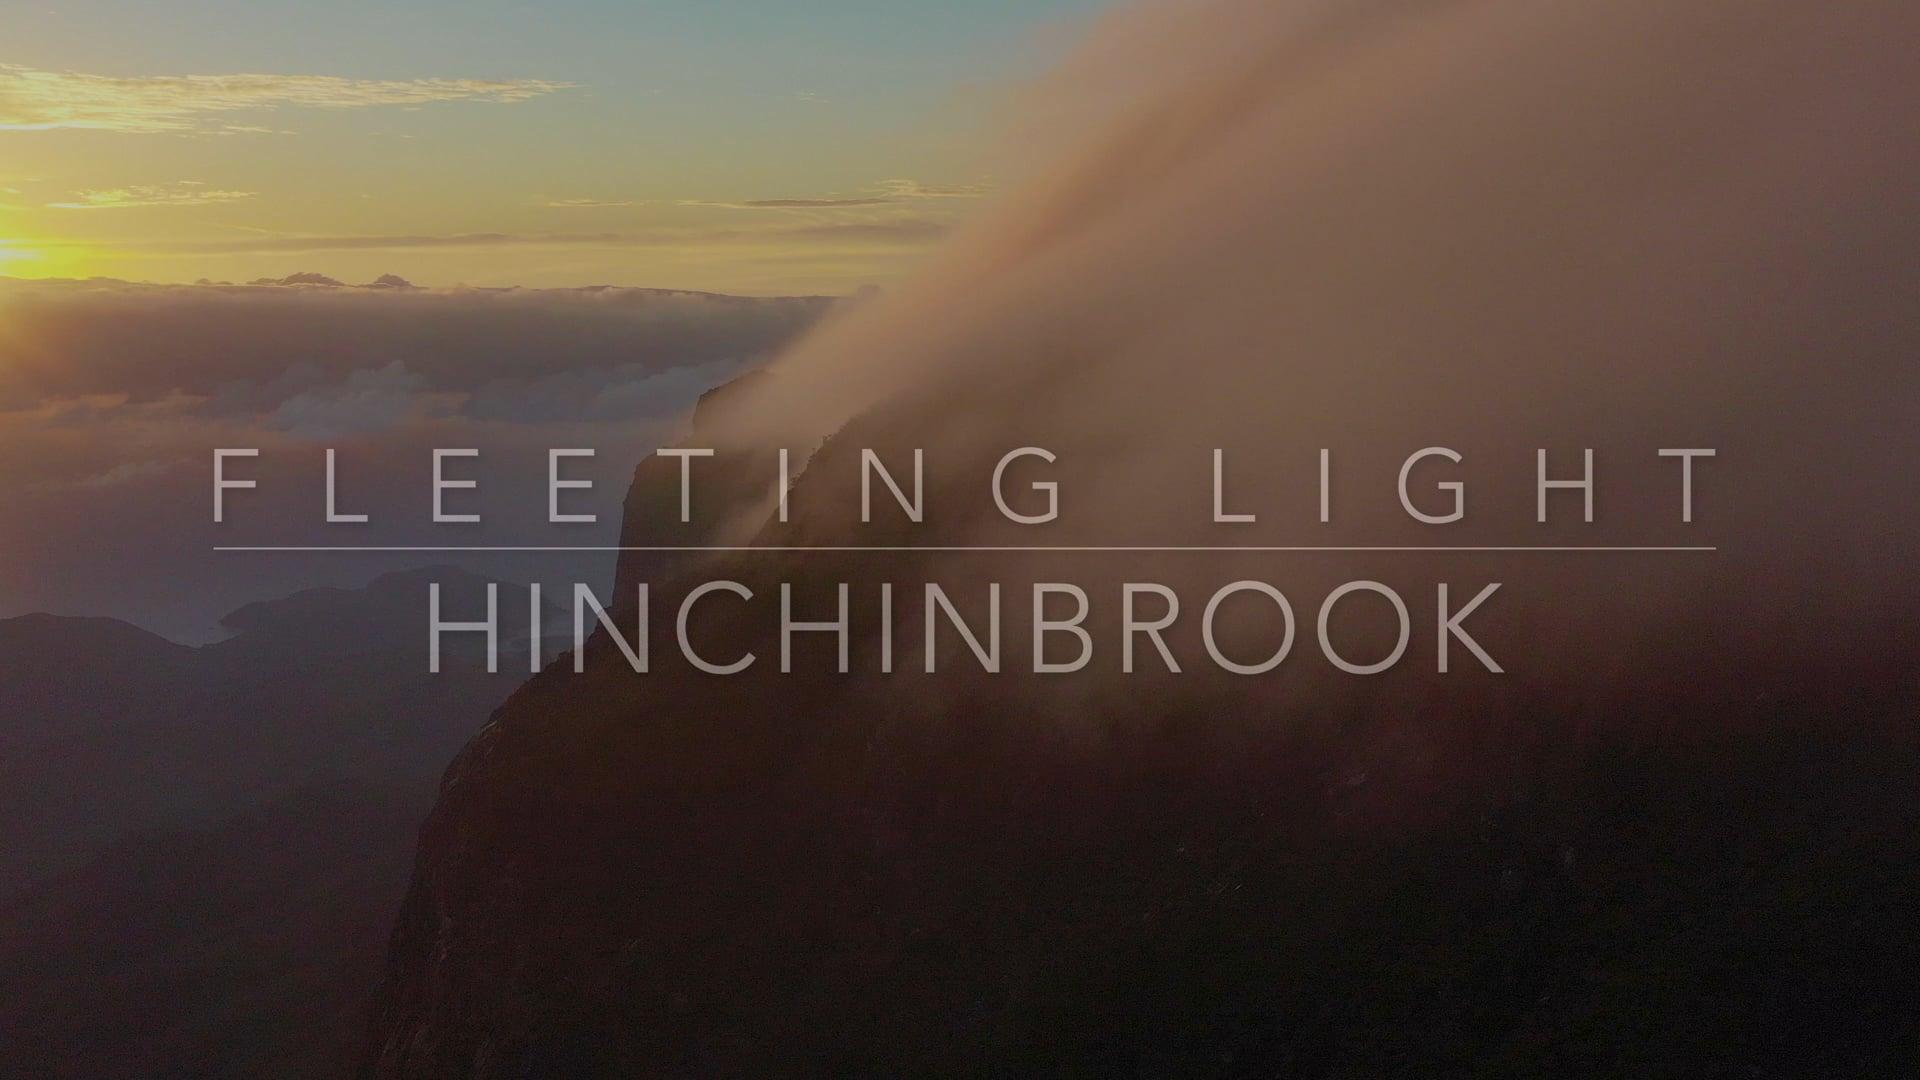 Fleeting Light - Hinchinbrook